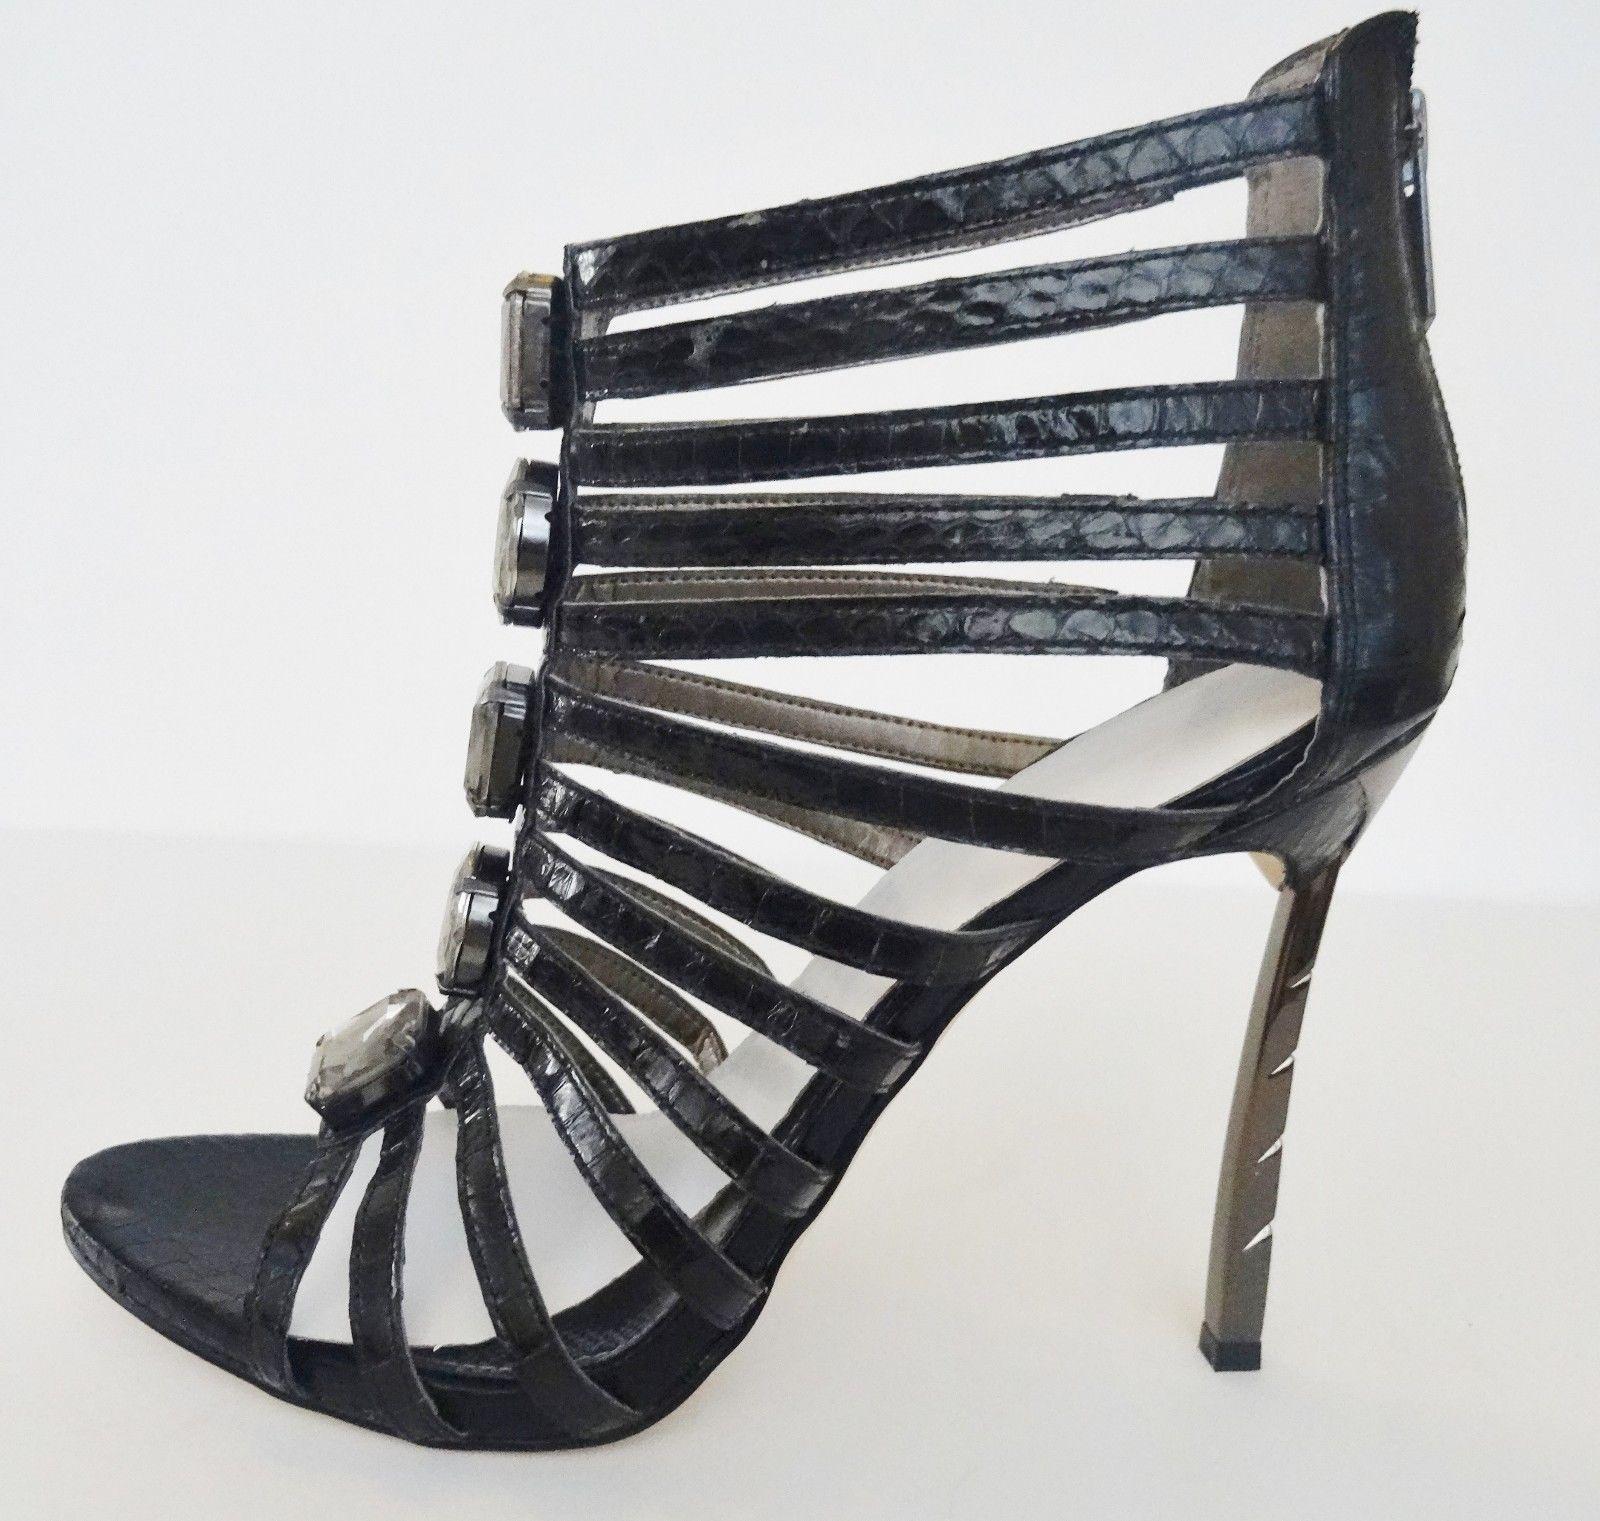 5687d43cf52ce NIB Sam Edelman Hampton Ankle Caged Sandal Shoes Sz 8.5 M Black Snakeskin   170